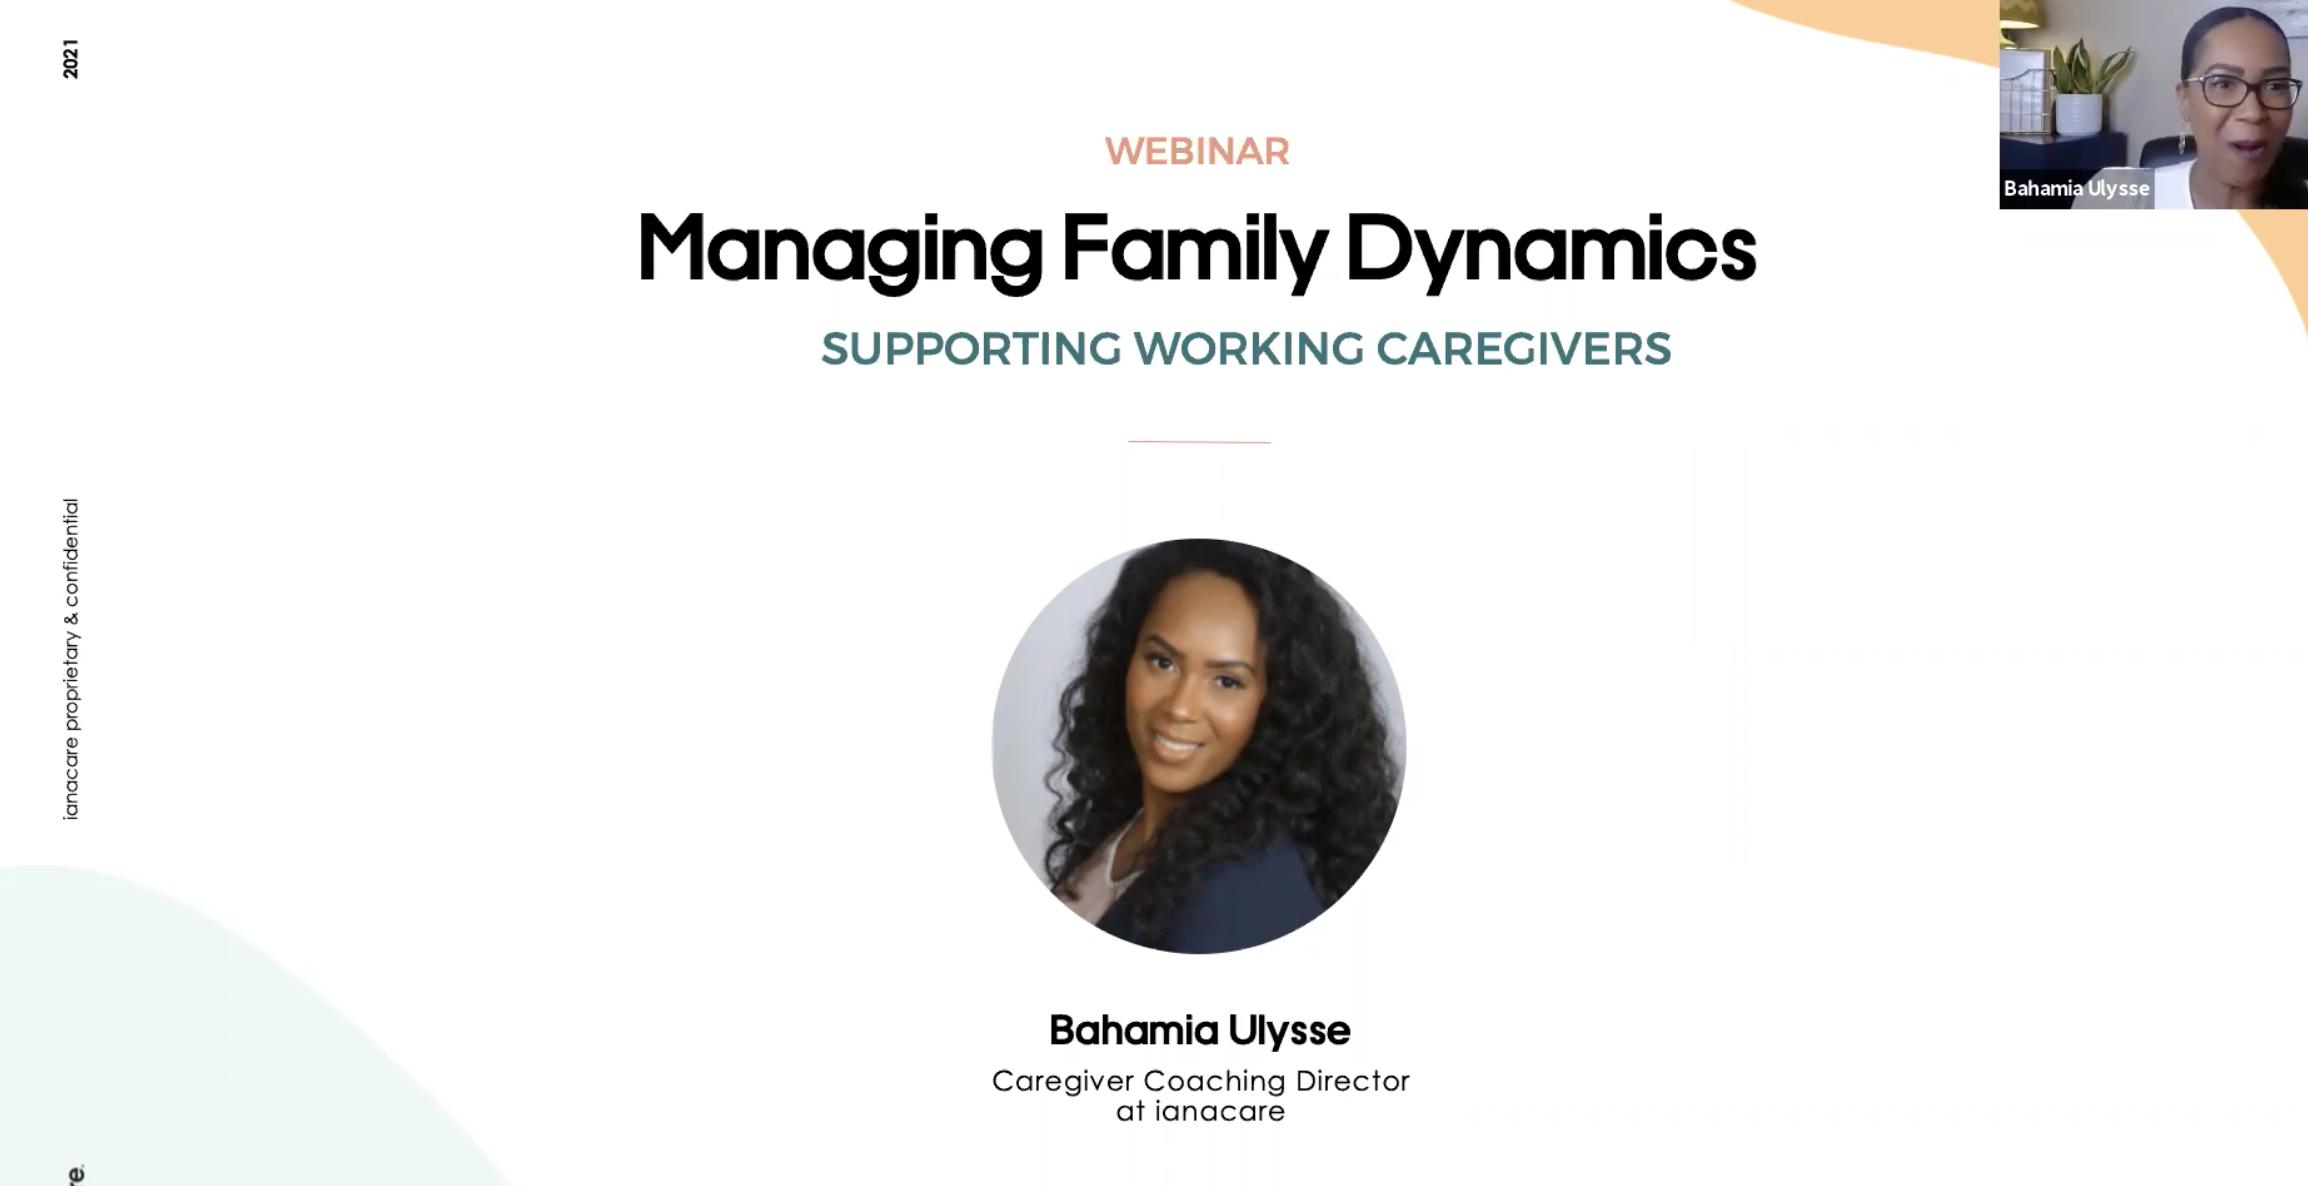 Watch: Managing Family Dynamics